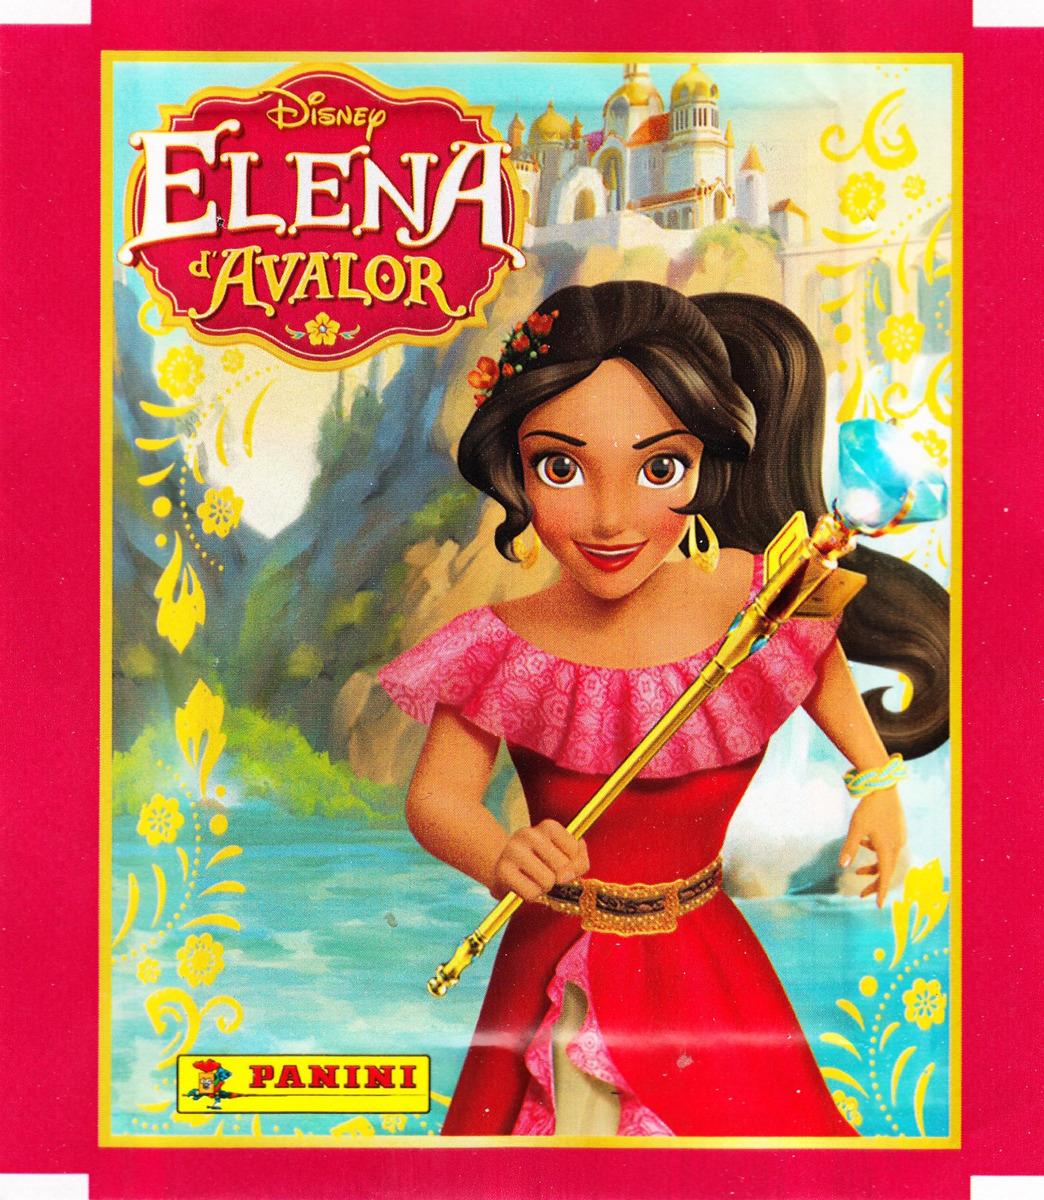 Набор наклеек Panini Elena of Avalor / Елена - принцесса Авалора, 5 шт набор наклеек panini elena of avalor елена принцесса авалора 5 шт